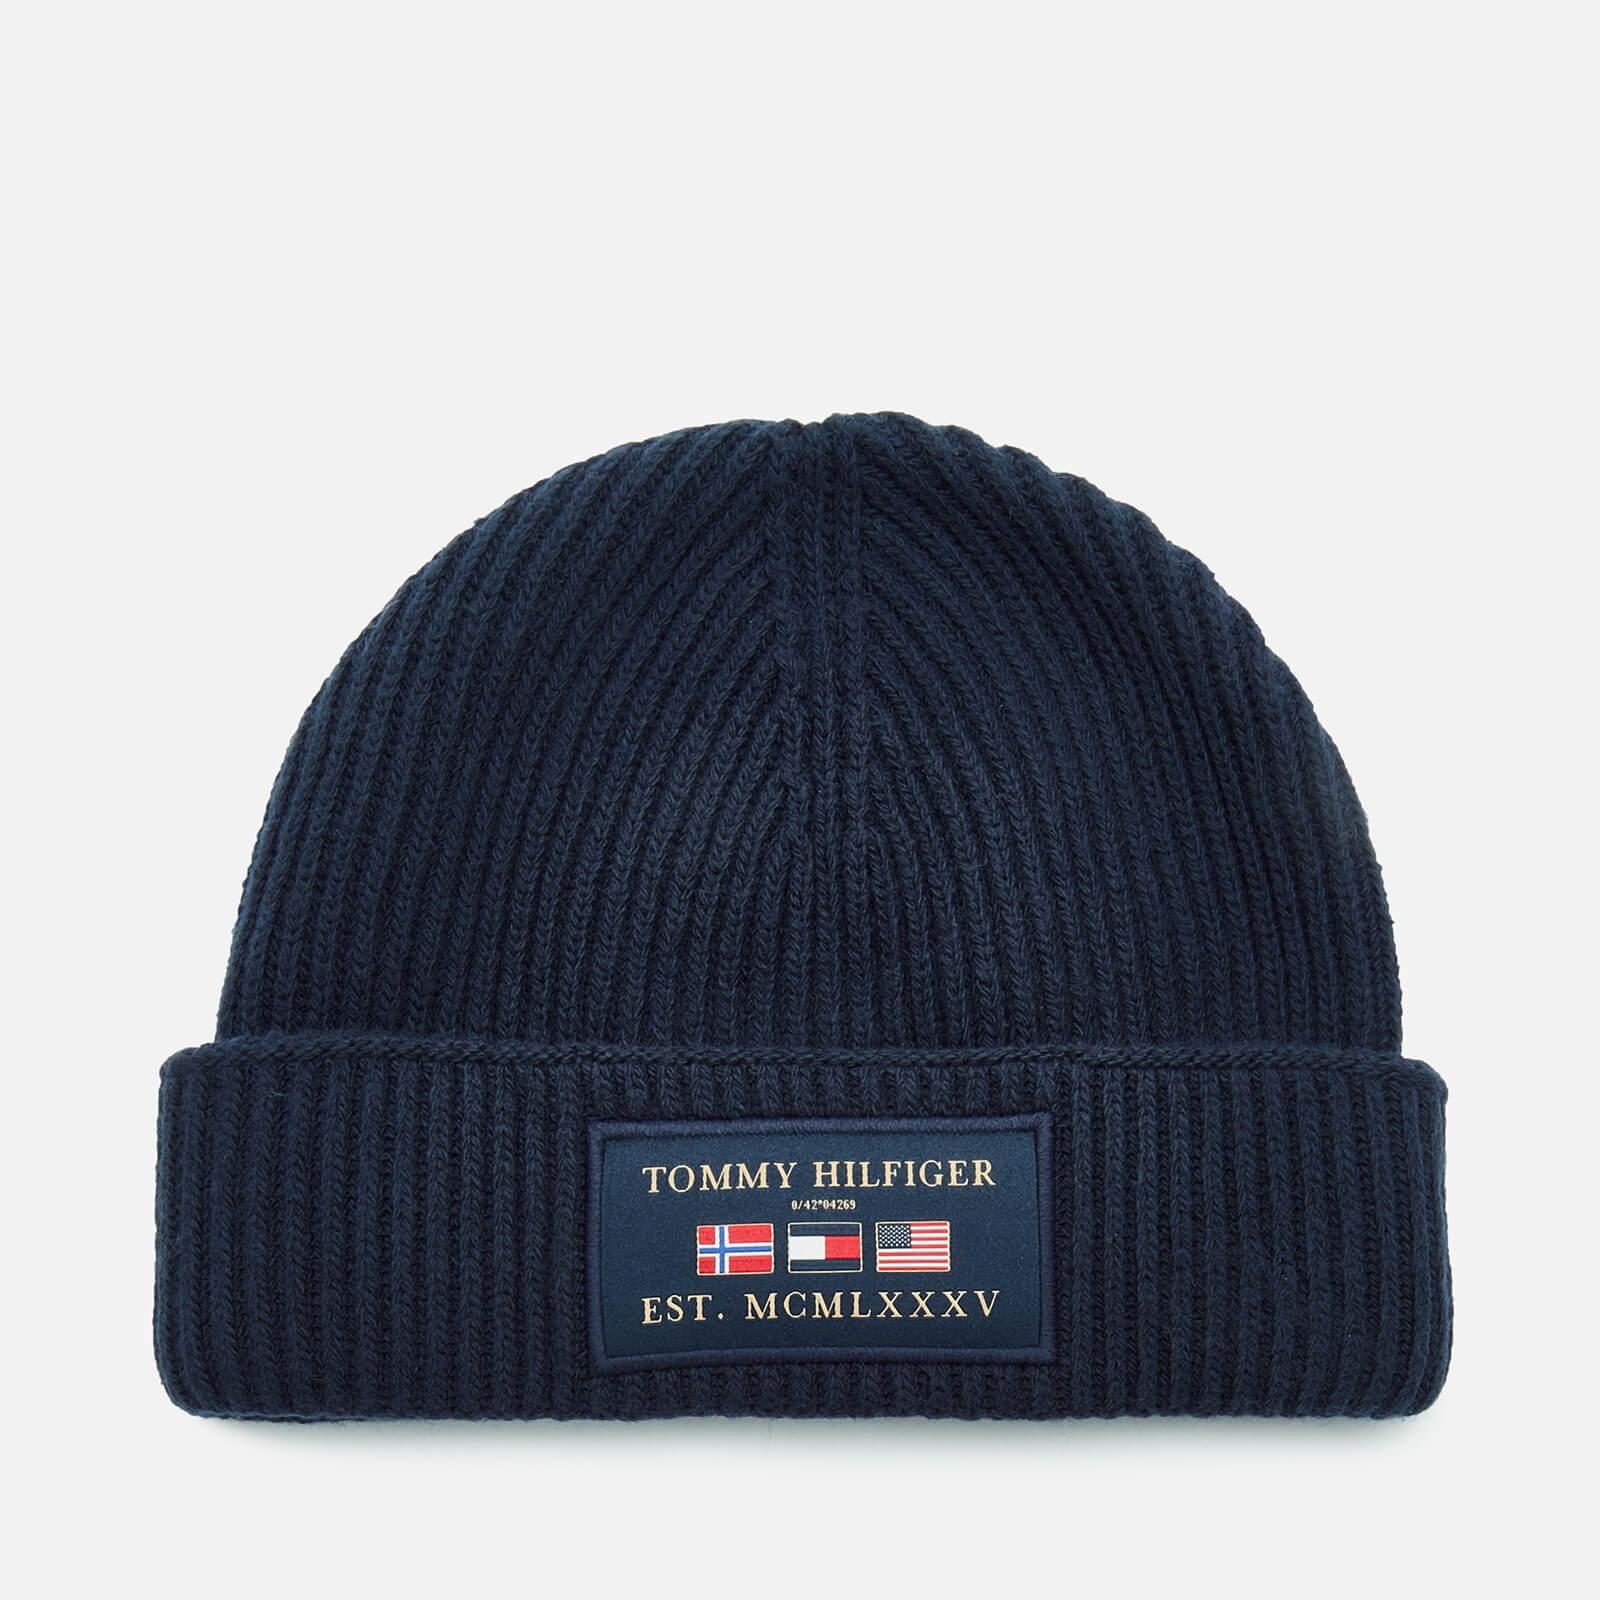 Tommy Hilfiger Men's Outdoors Patch Beanie Hat - Sky Captain